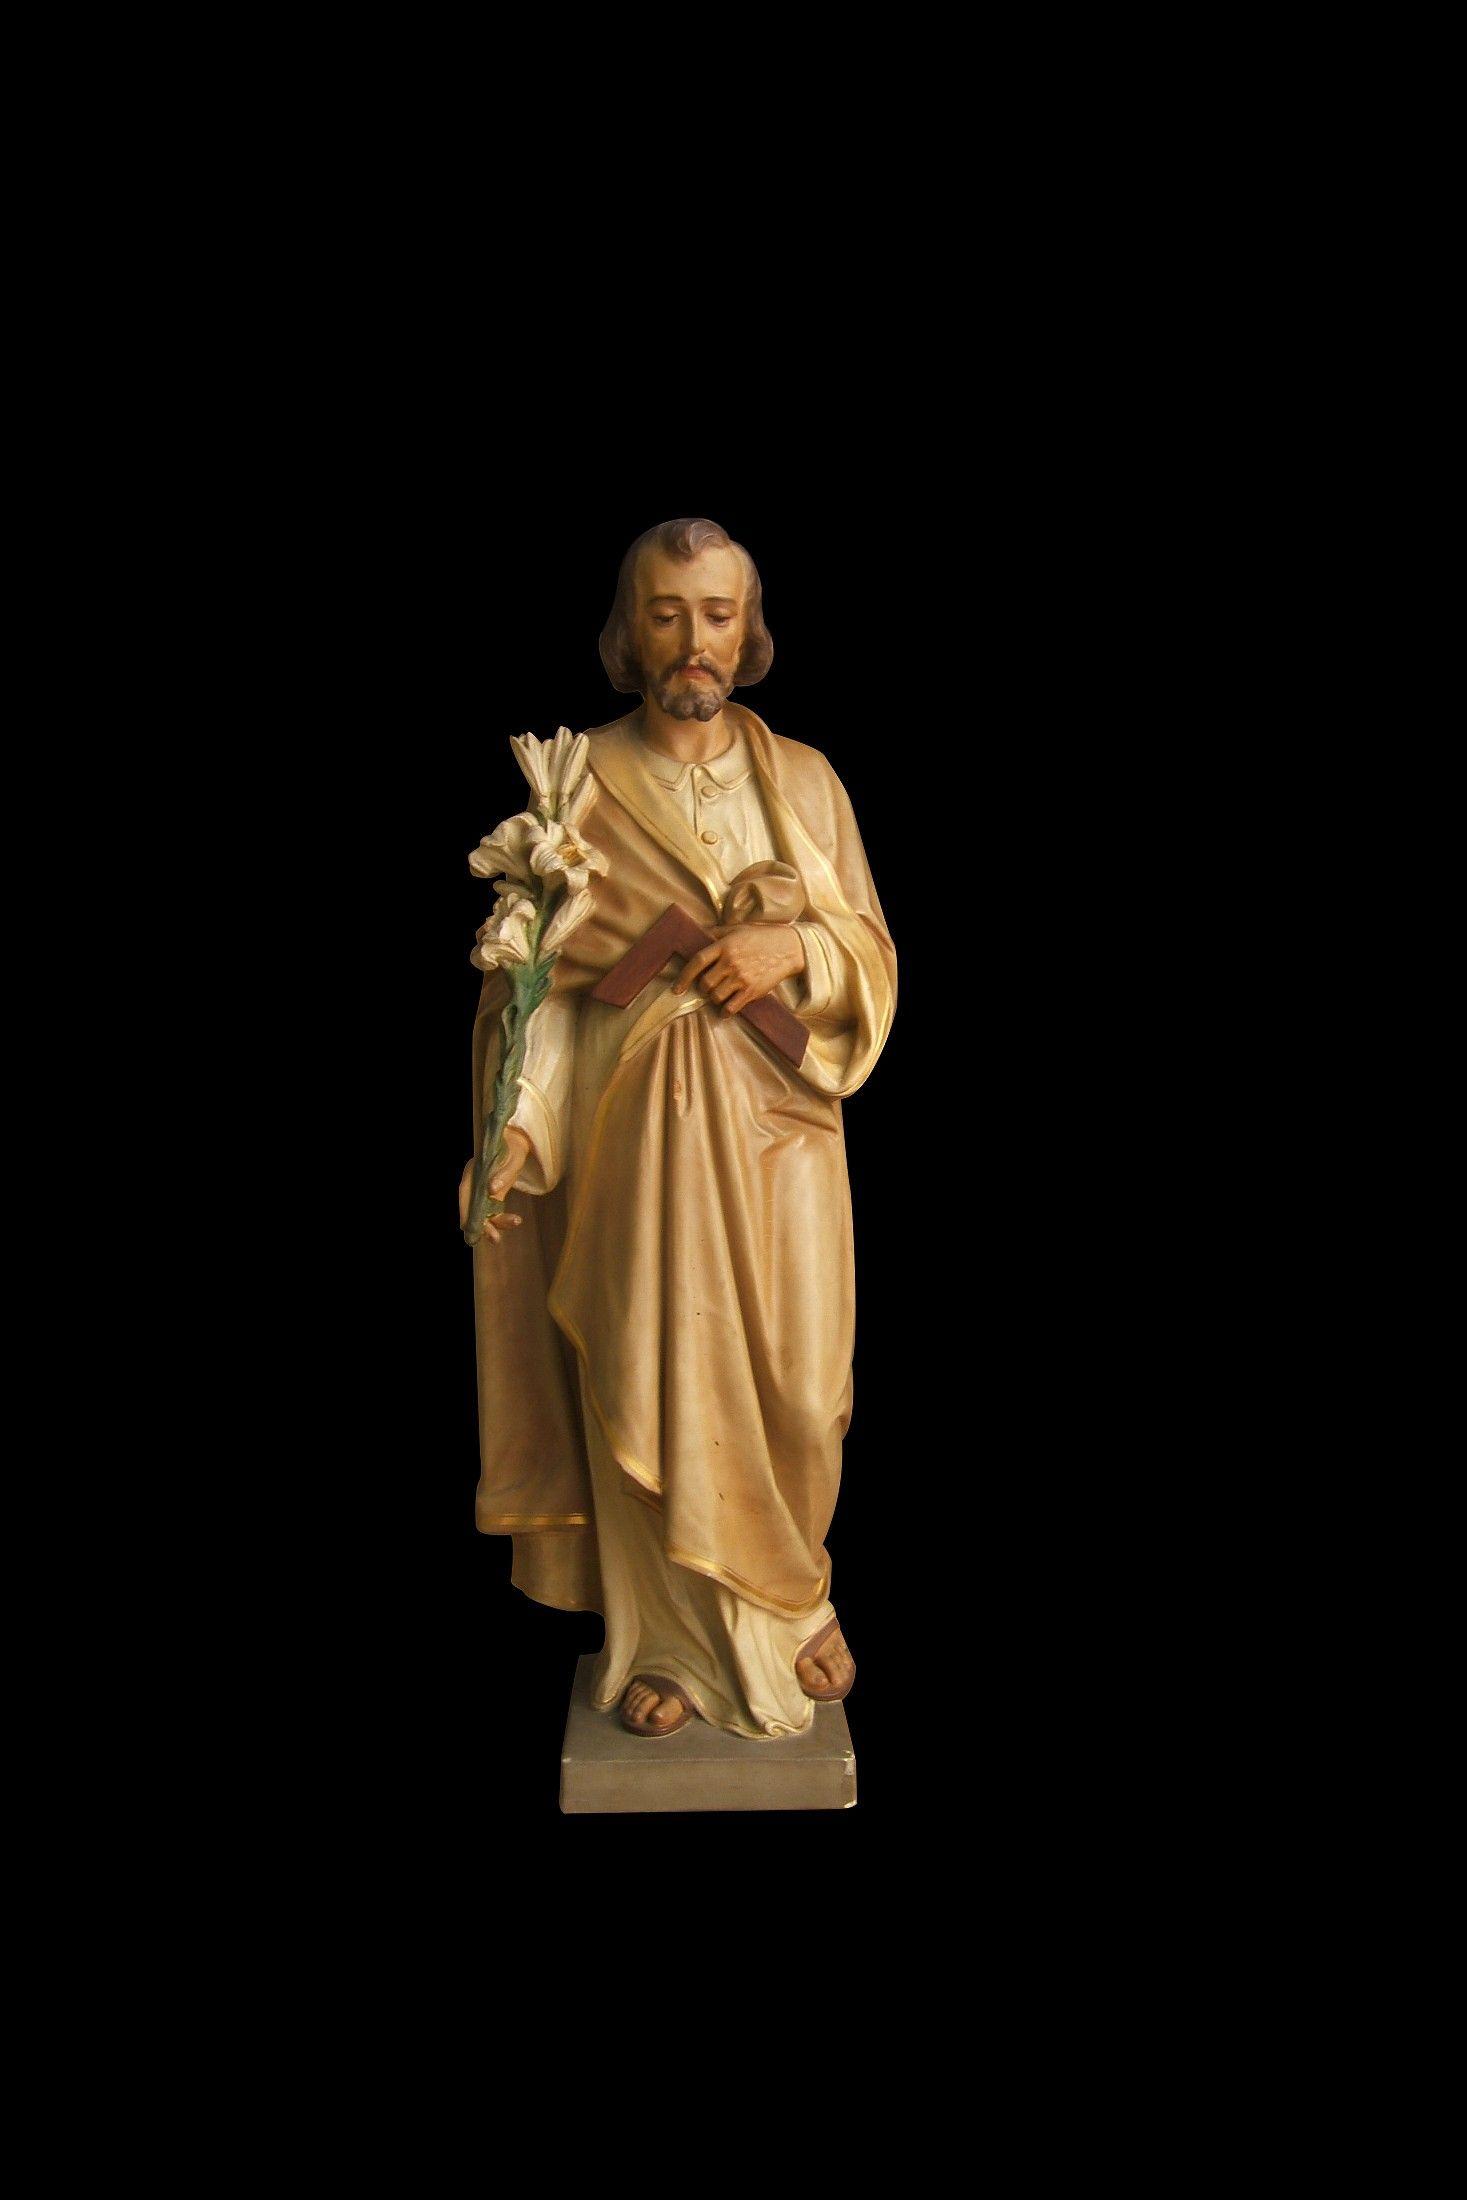 Vintage Traditional Daprato Catholic St  Joseph the